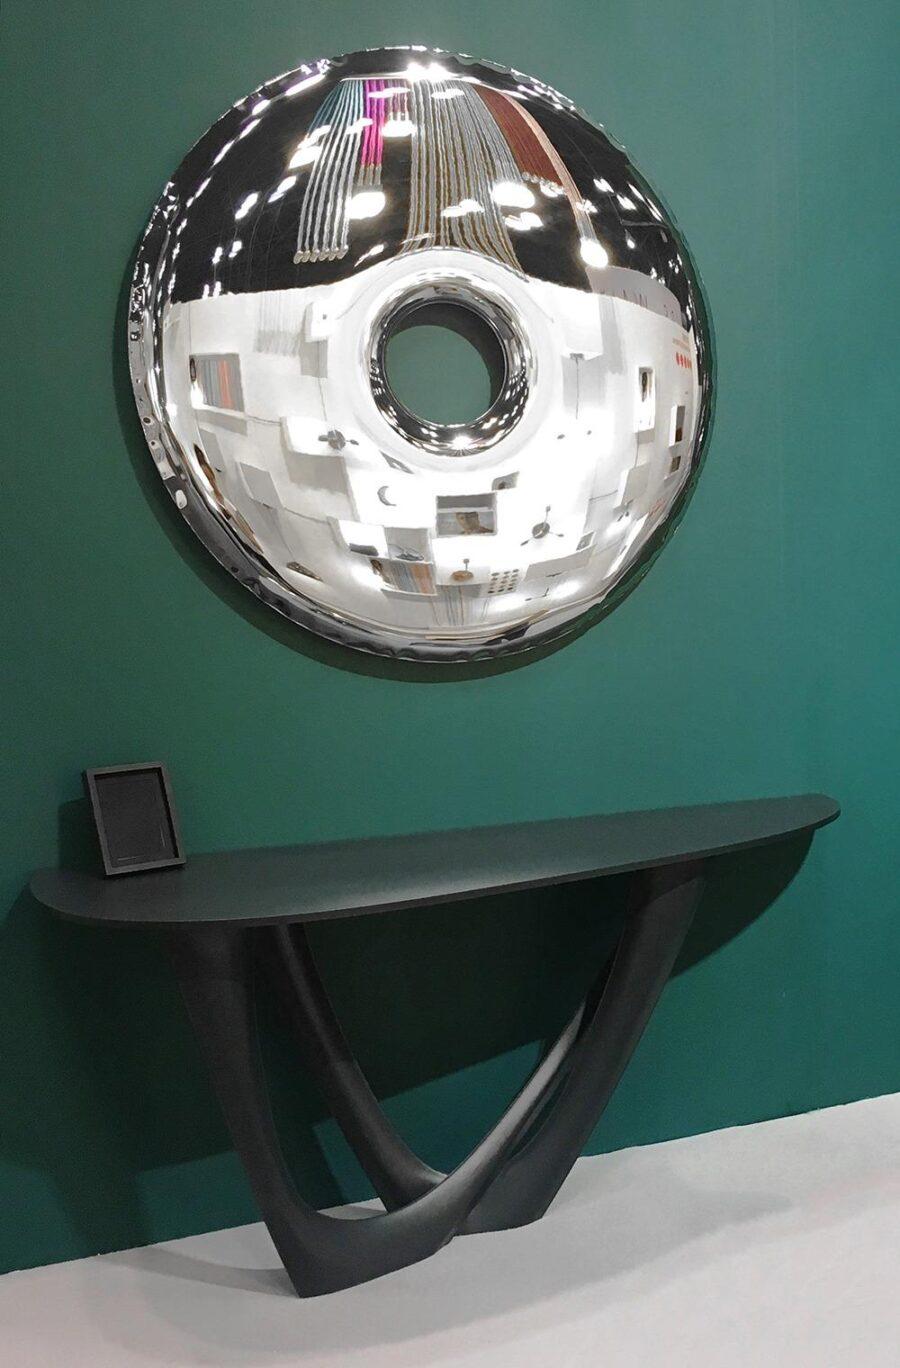 g-console duo rondo mirror